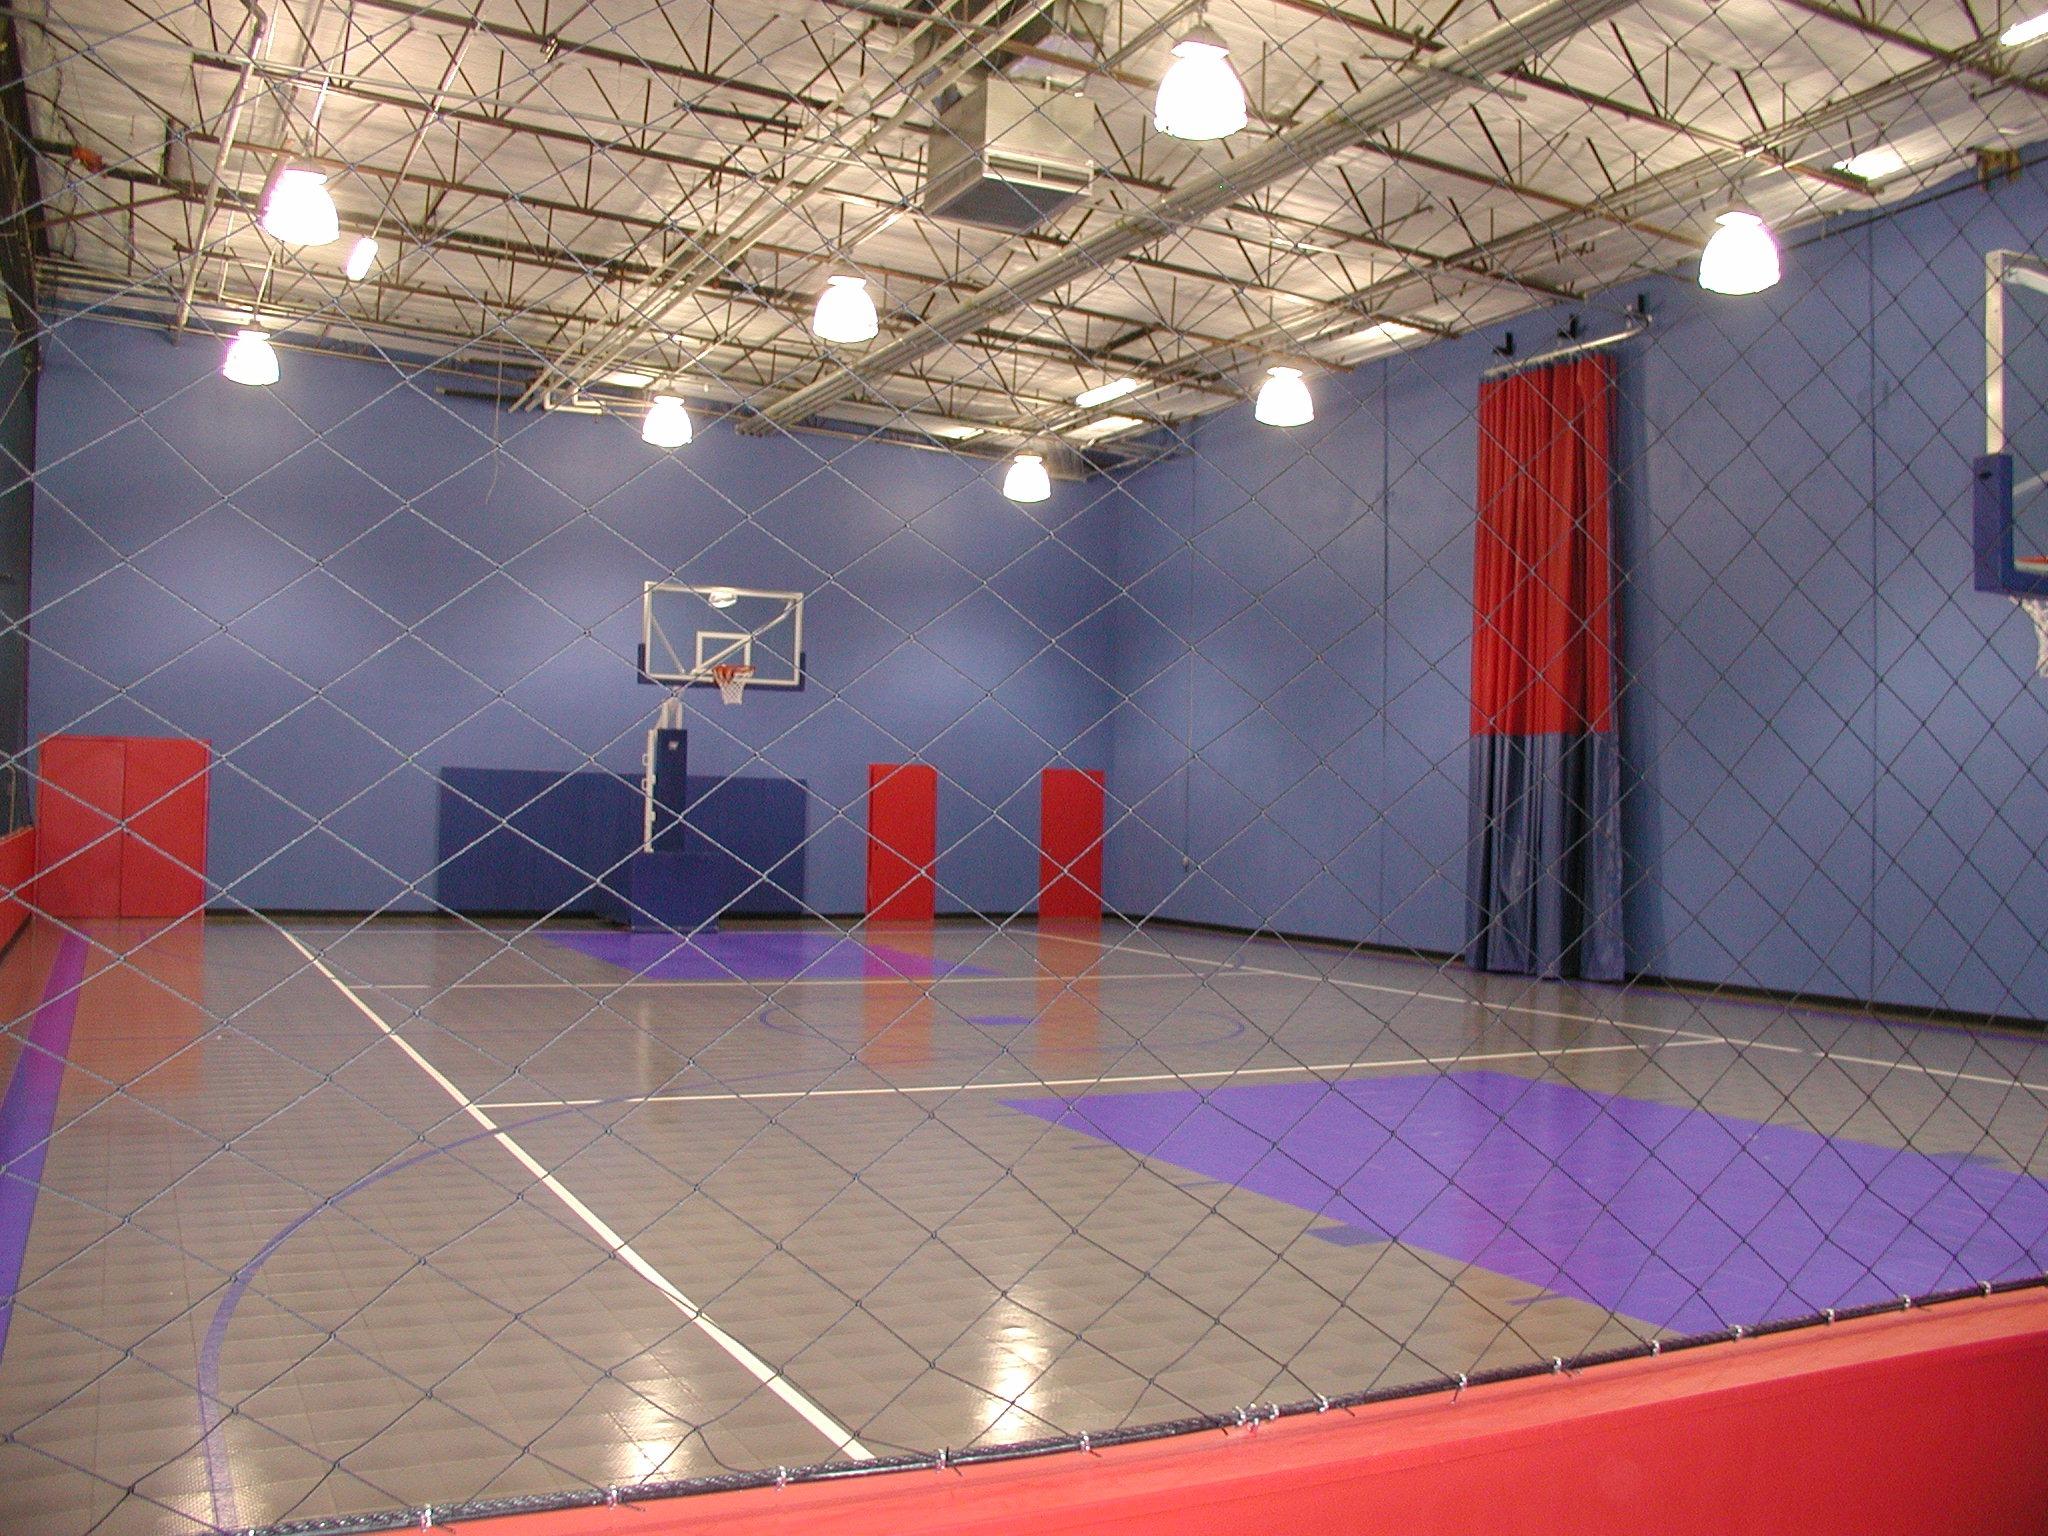 Open Indoor Basketball Gyms Near Me | Basketball Scores